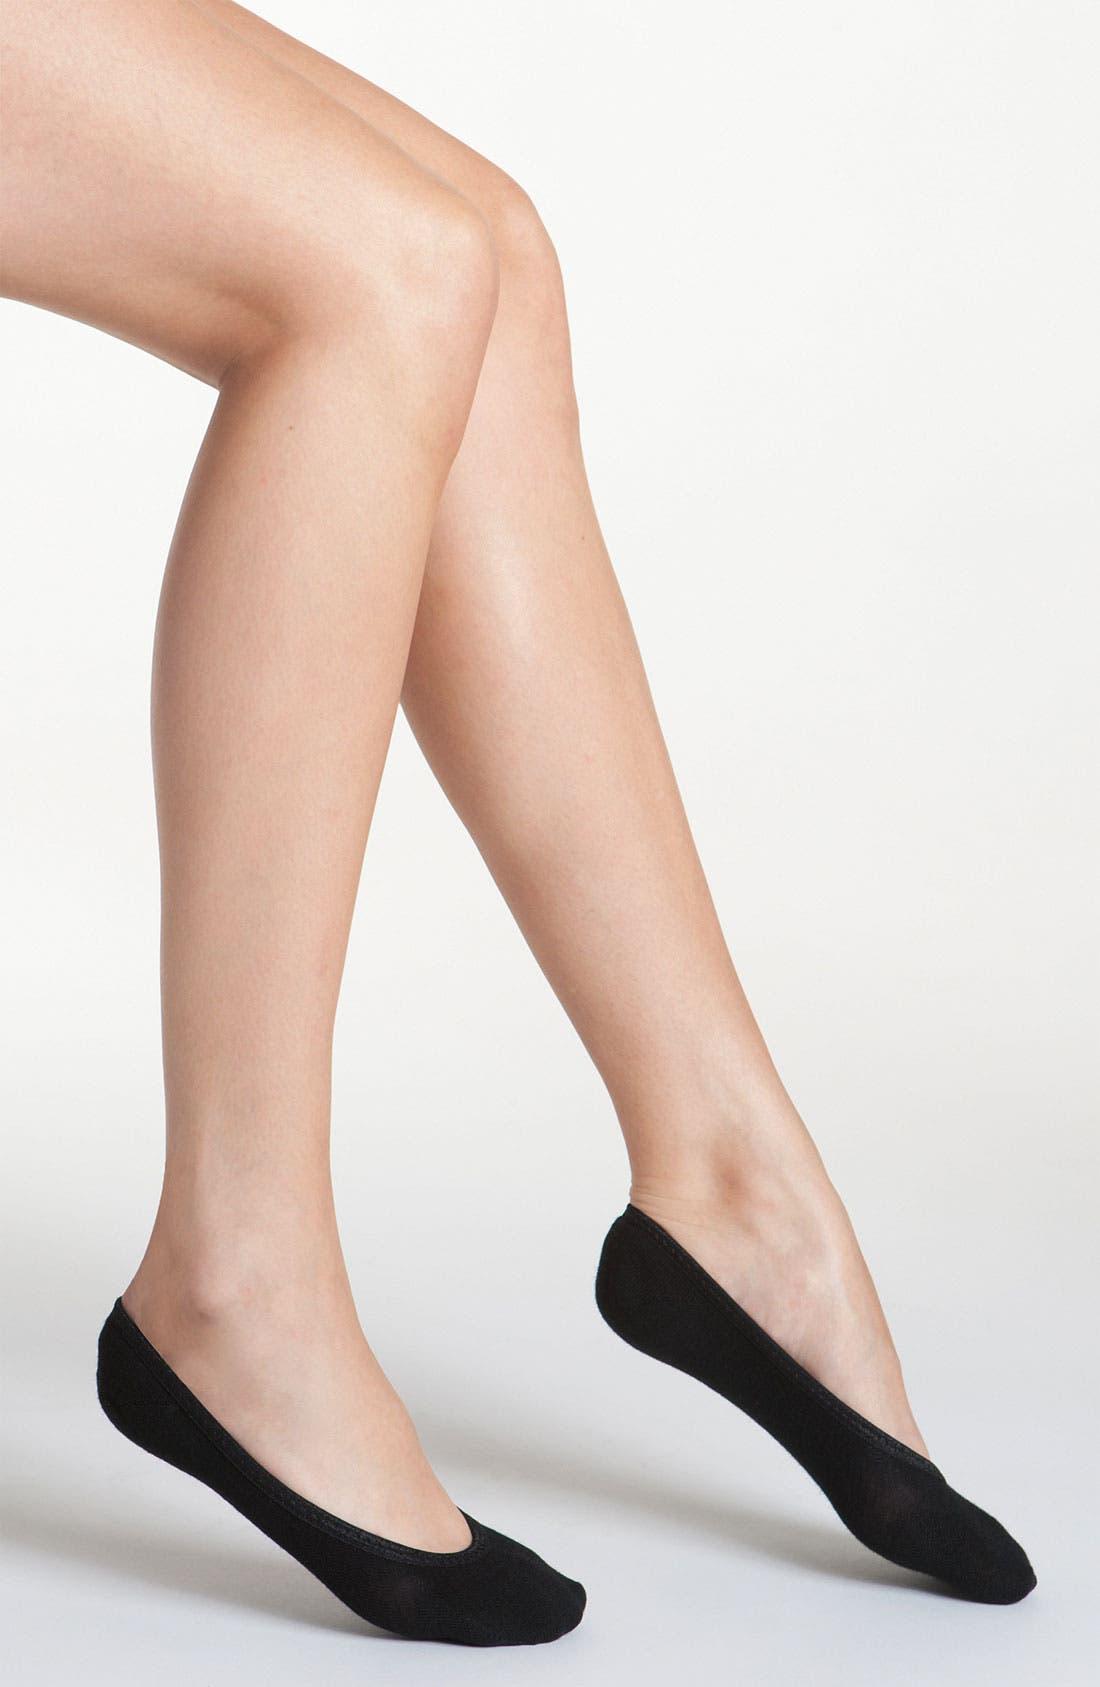 Alternate Image 1 Selected - Smartwool 'Secret Sleuth' Liner Socks